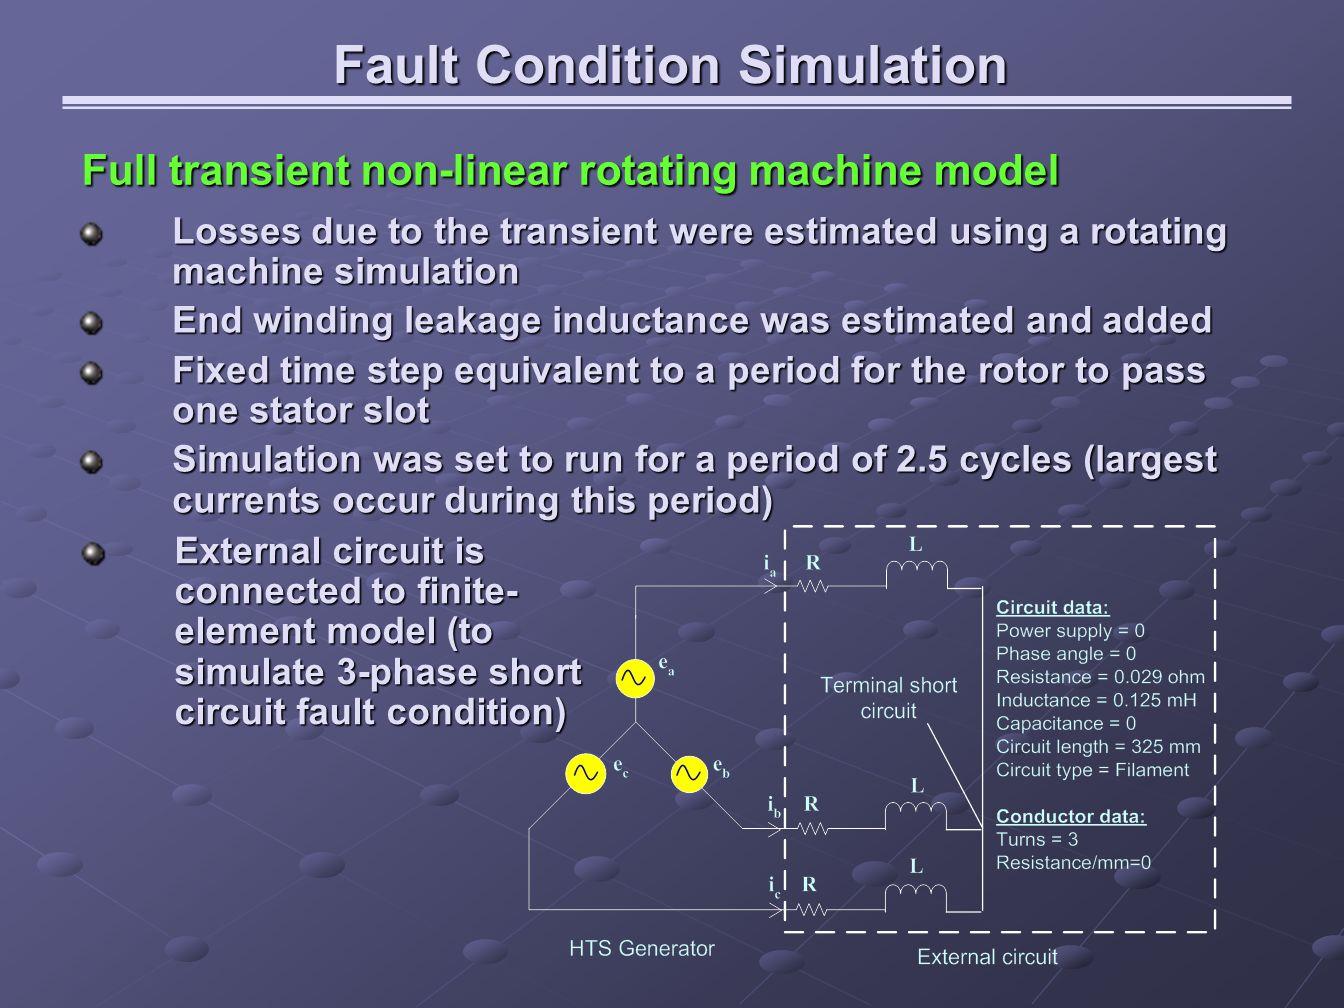 Fault Condition Simulation